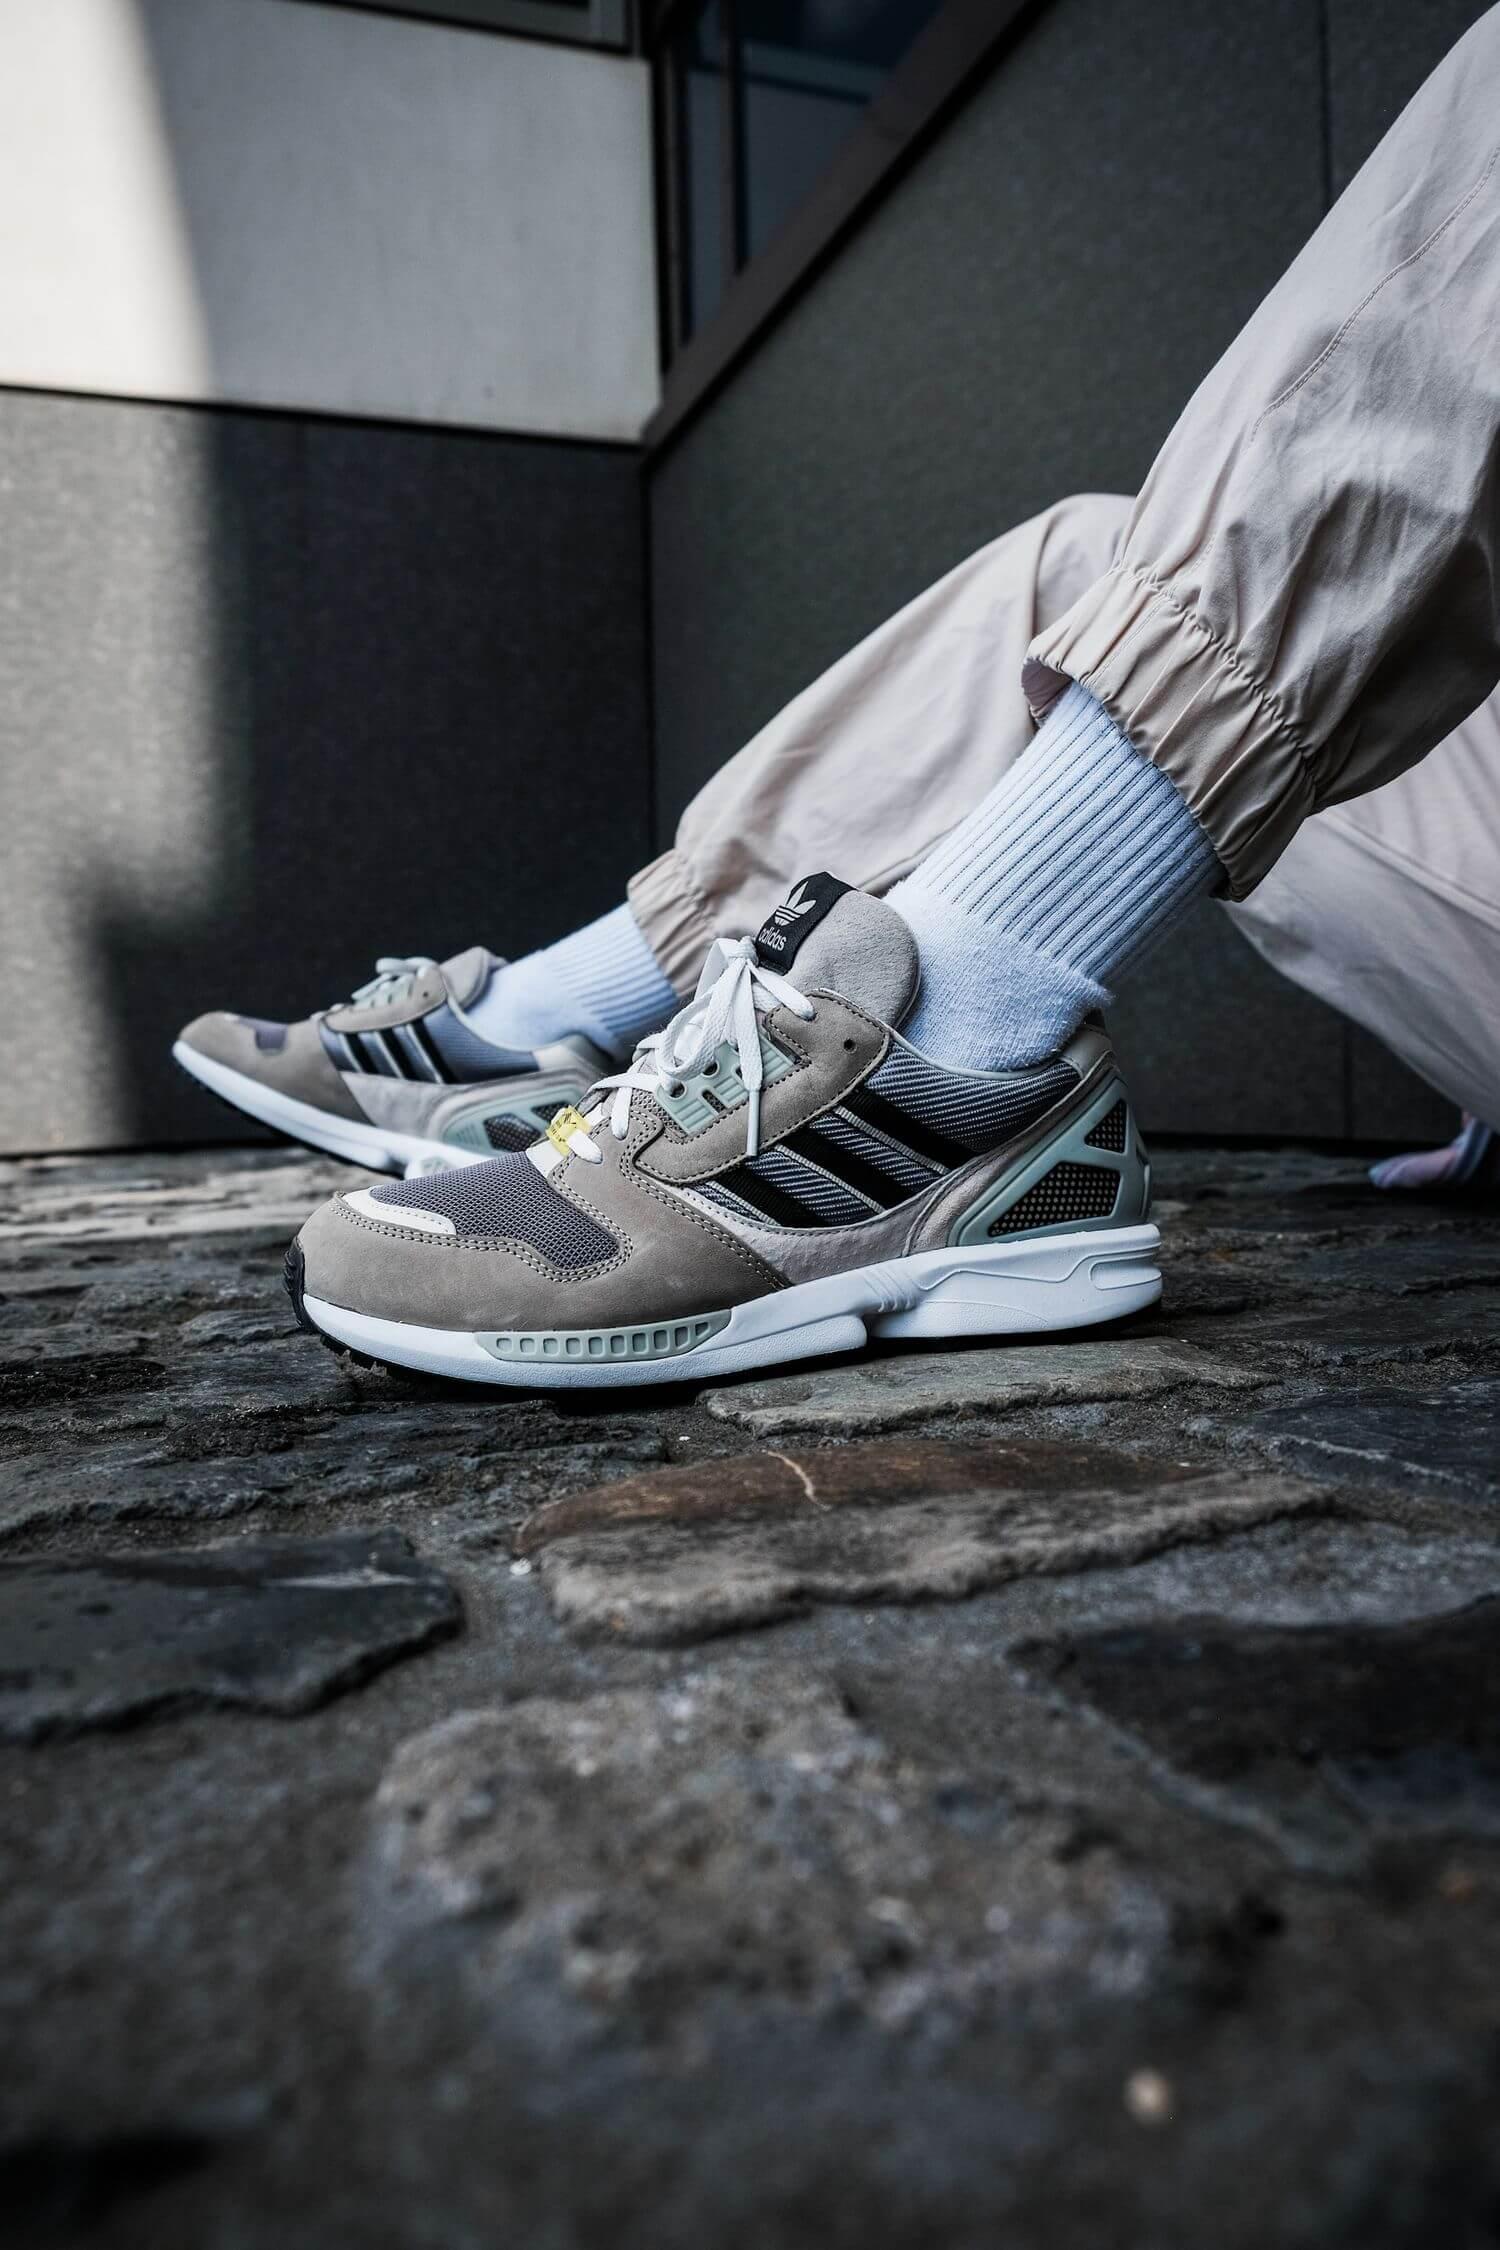 on feet - adidas - ZX8000 - feather grey/core black/aluminium - H02124